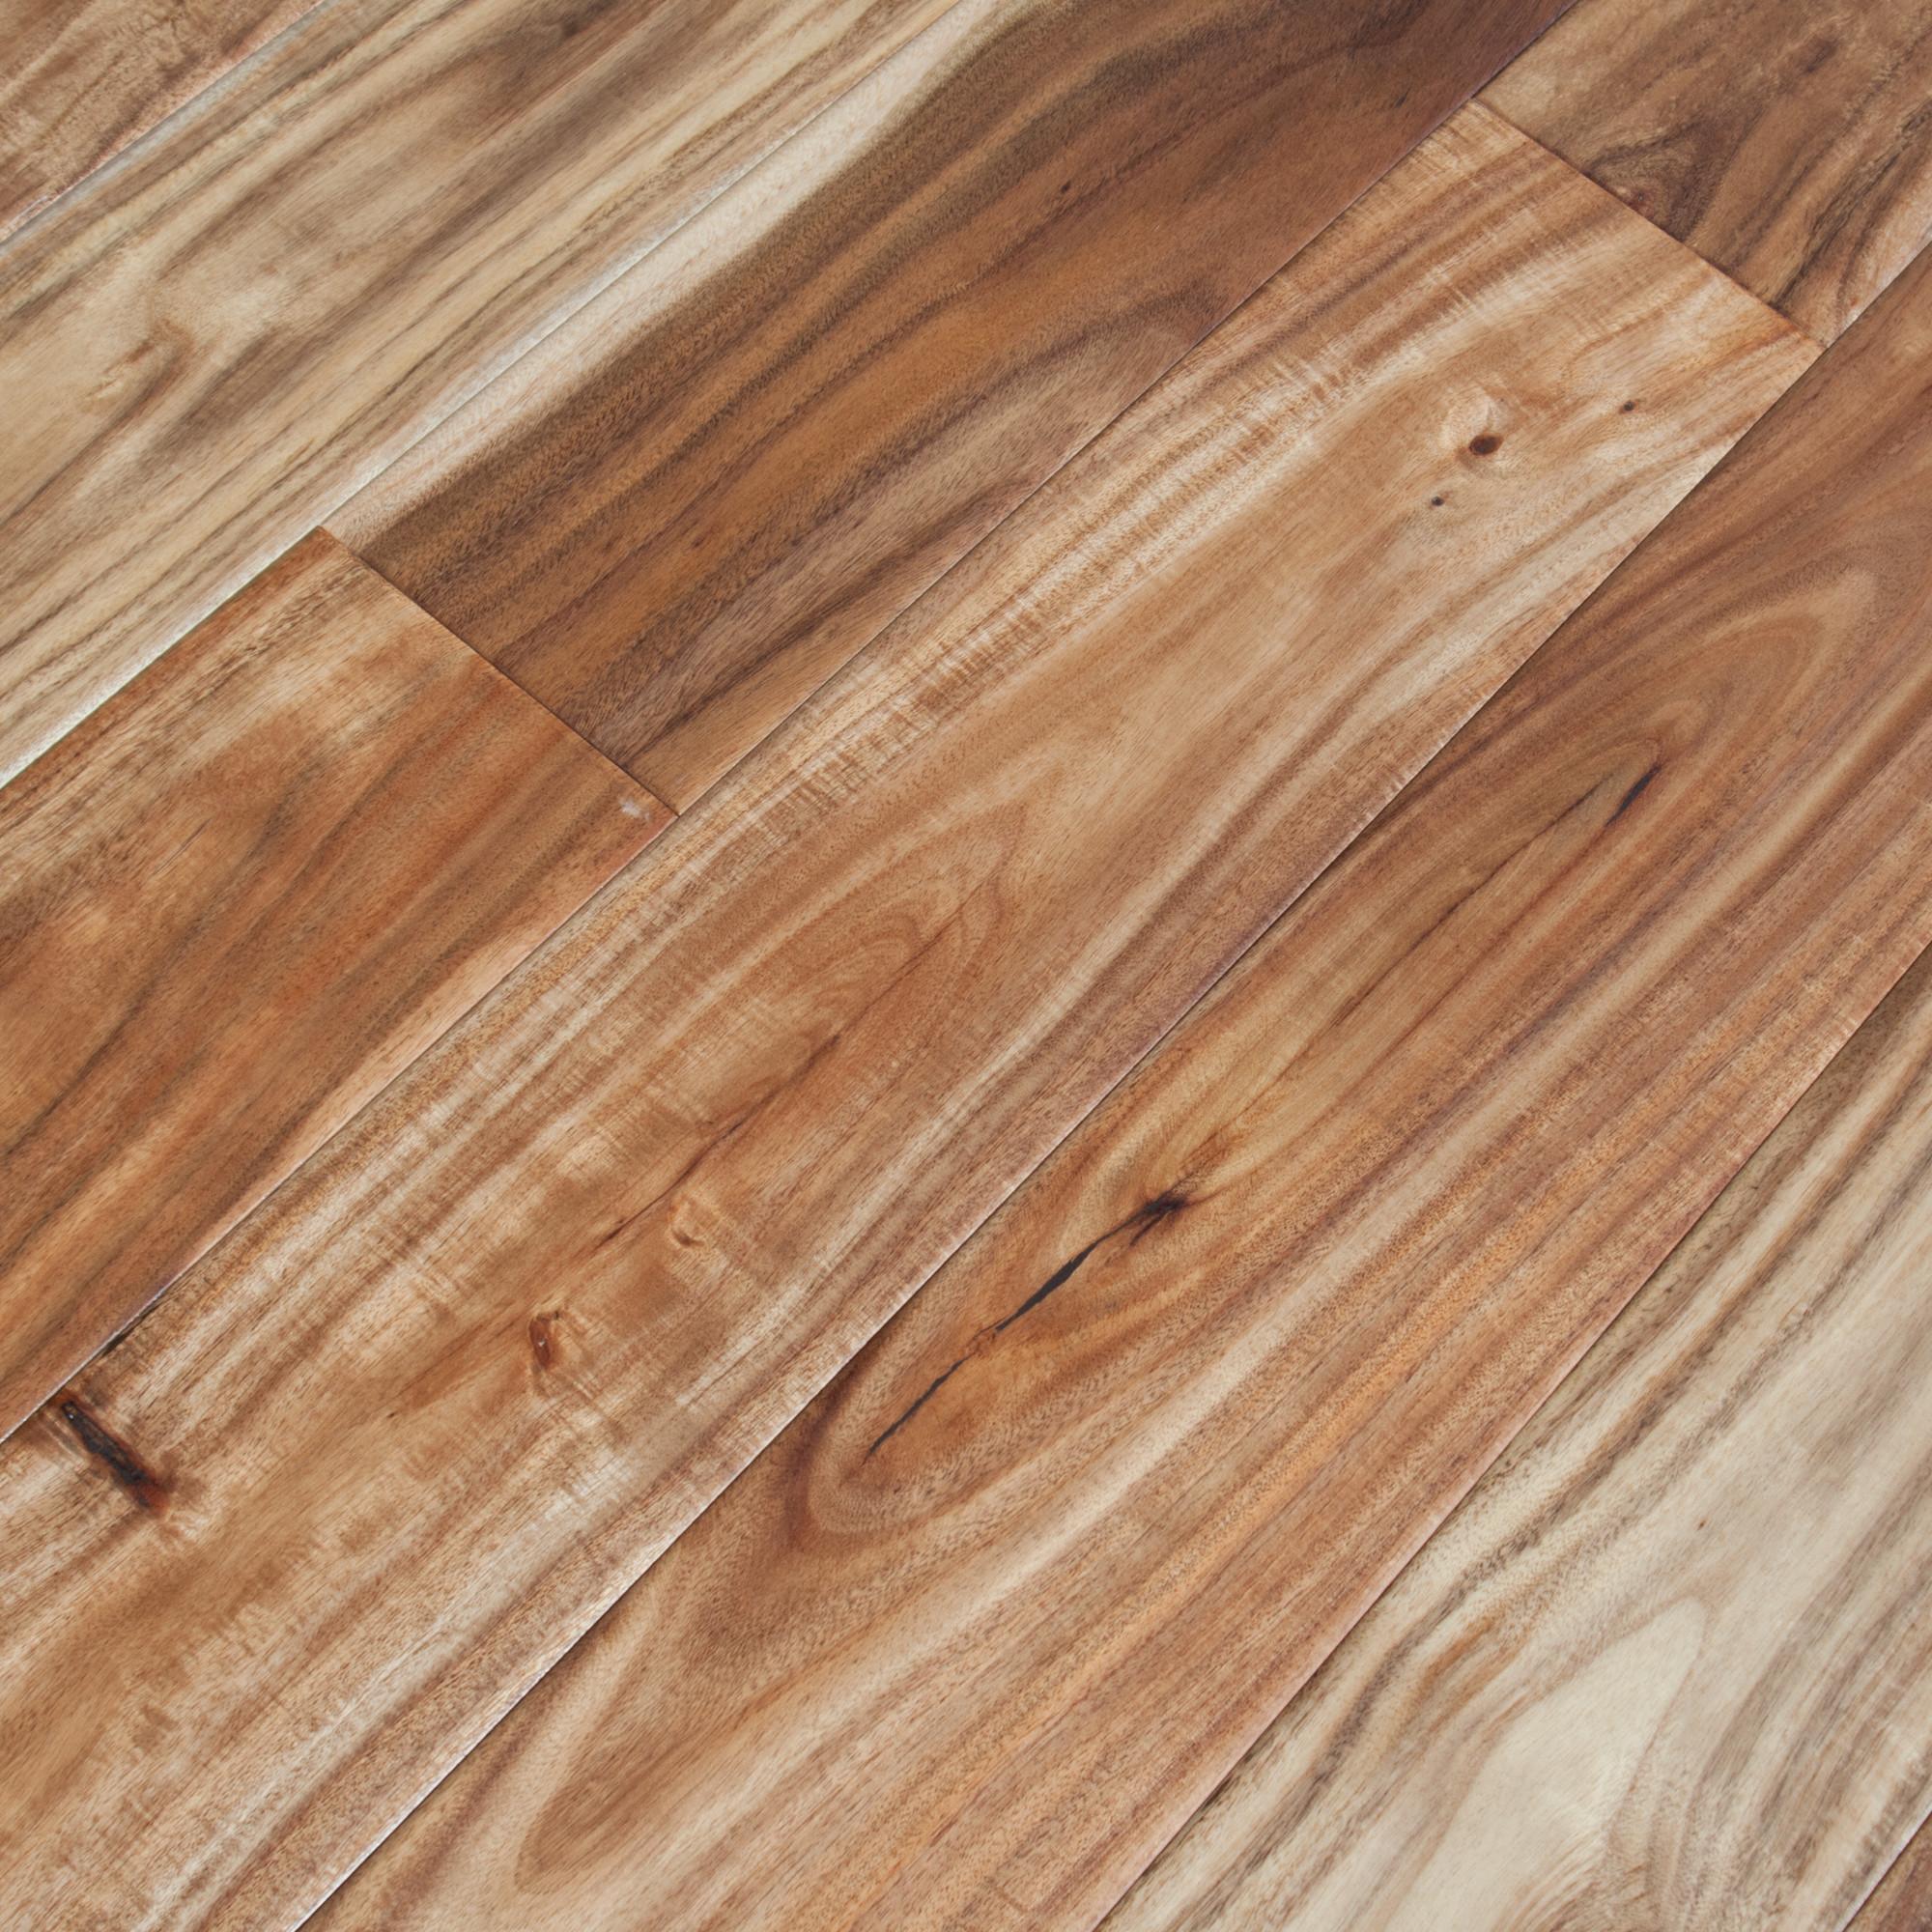 how to care for engineered hardwood floors of 9 mile creek acacia hand scraped acacia confusa wood floors inside acacia handscraped natural hardwood flooring